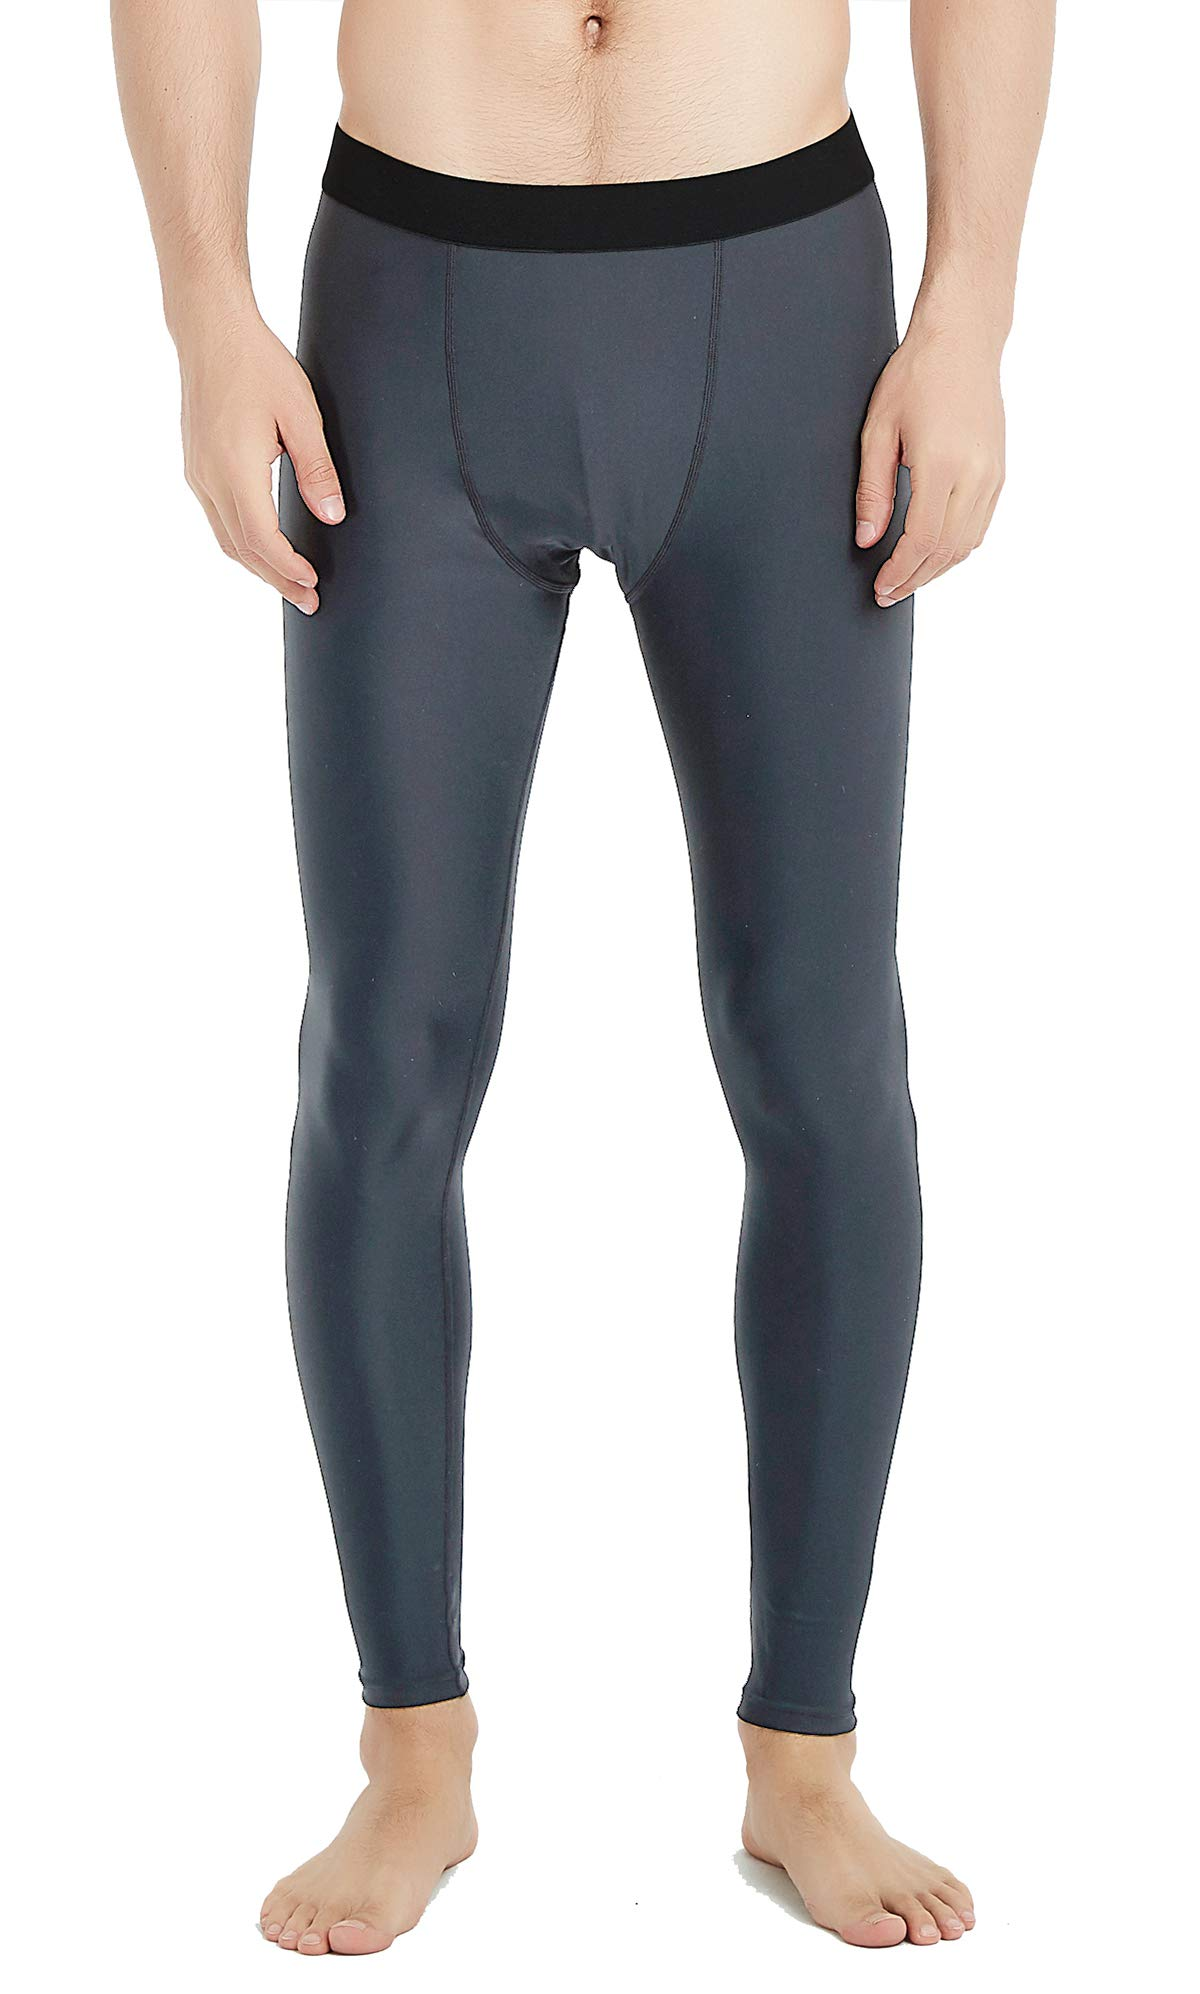 UPF 50+ Men's Surfing Leggings Sun Protection High-Waist Tummy Control Swimming Pants(6006gray-M) by Lemorecn